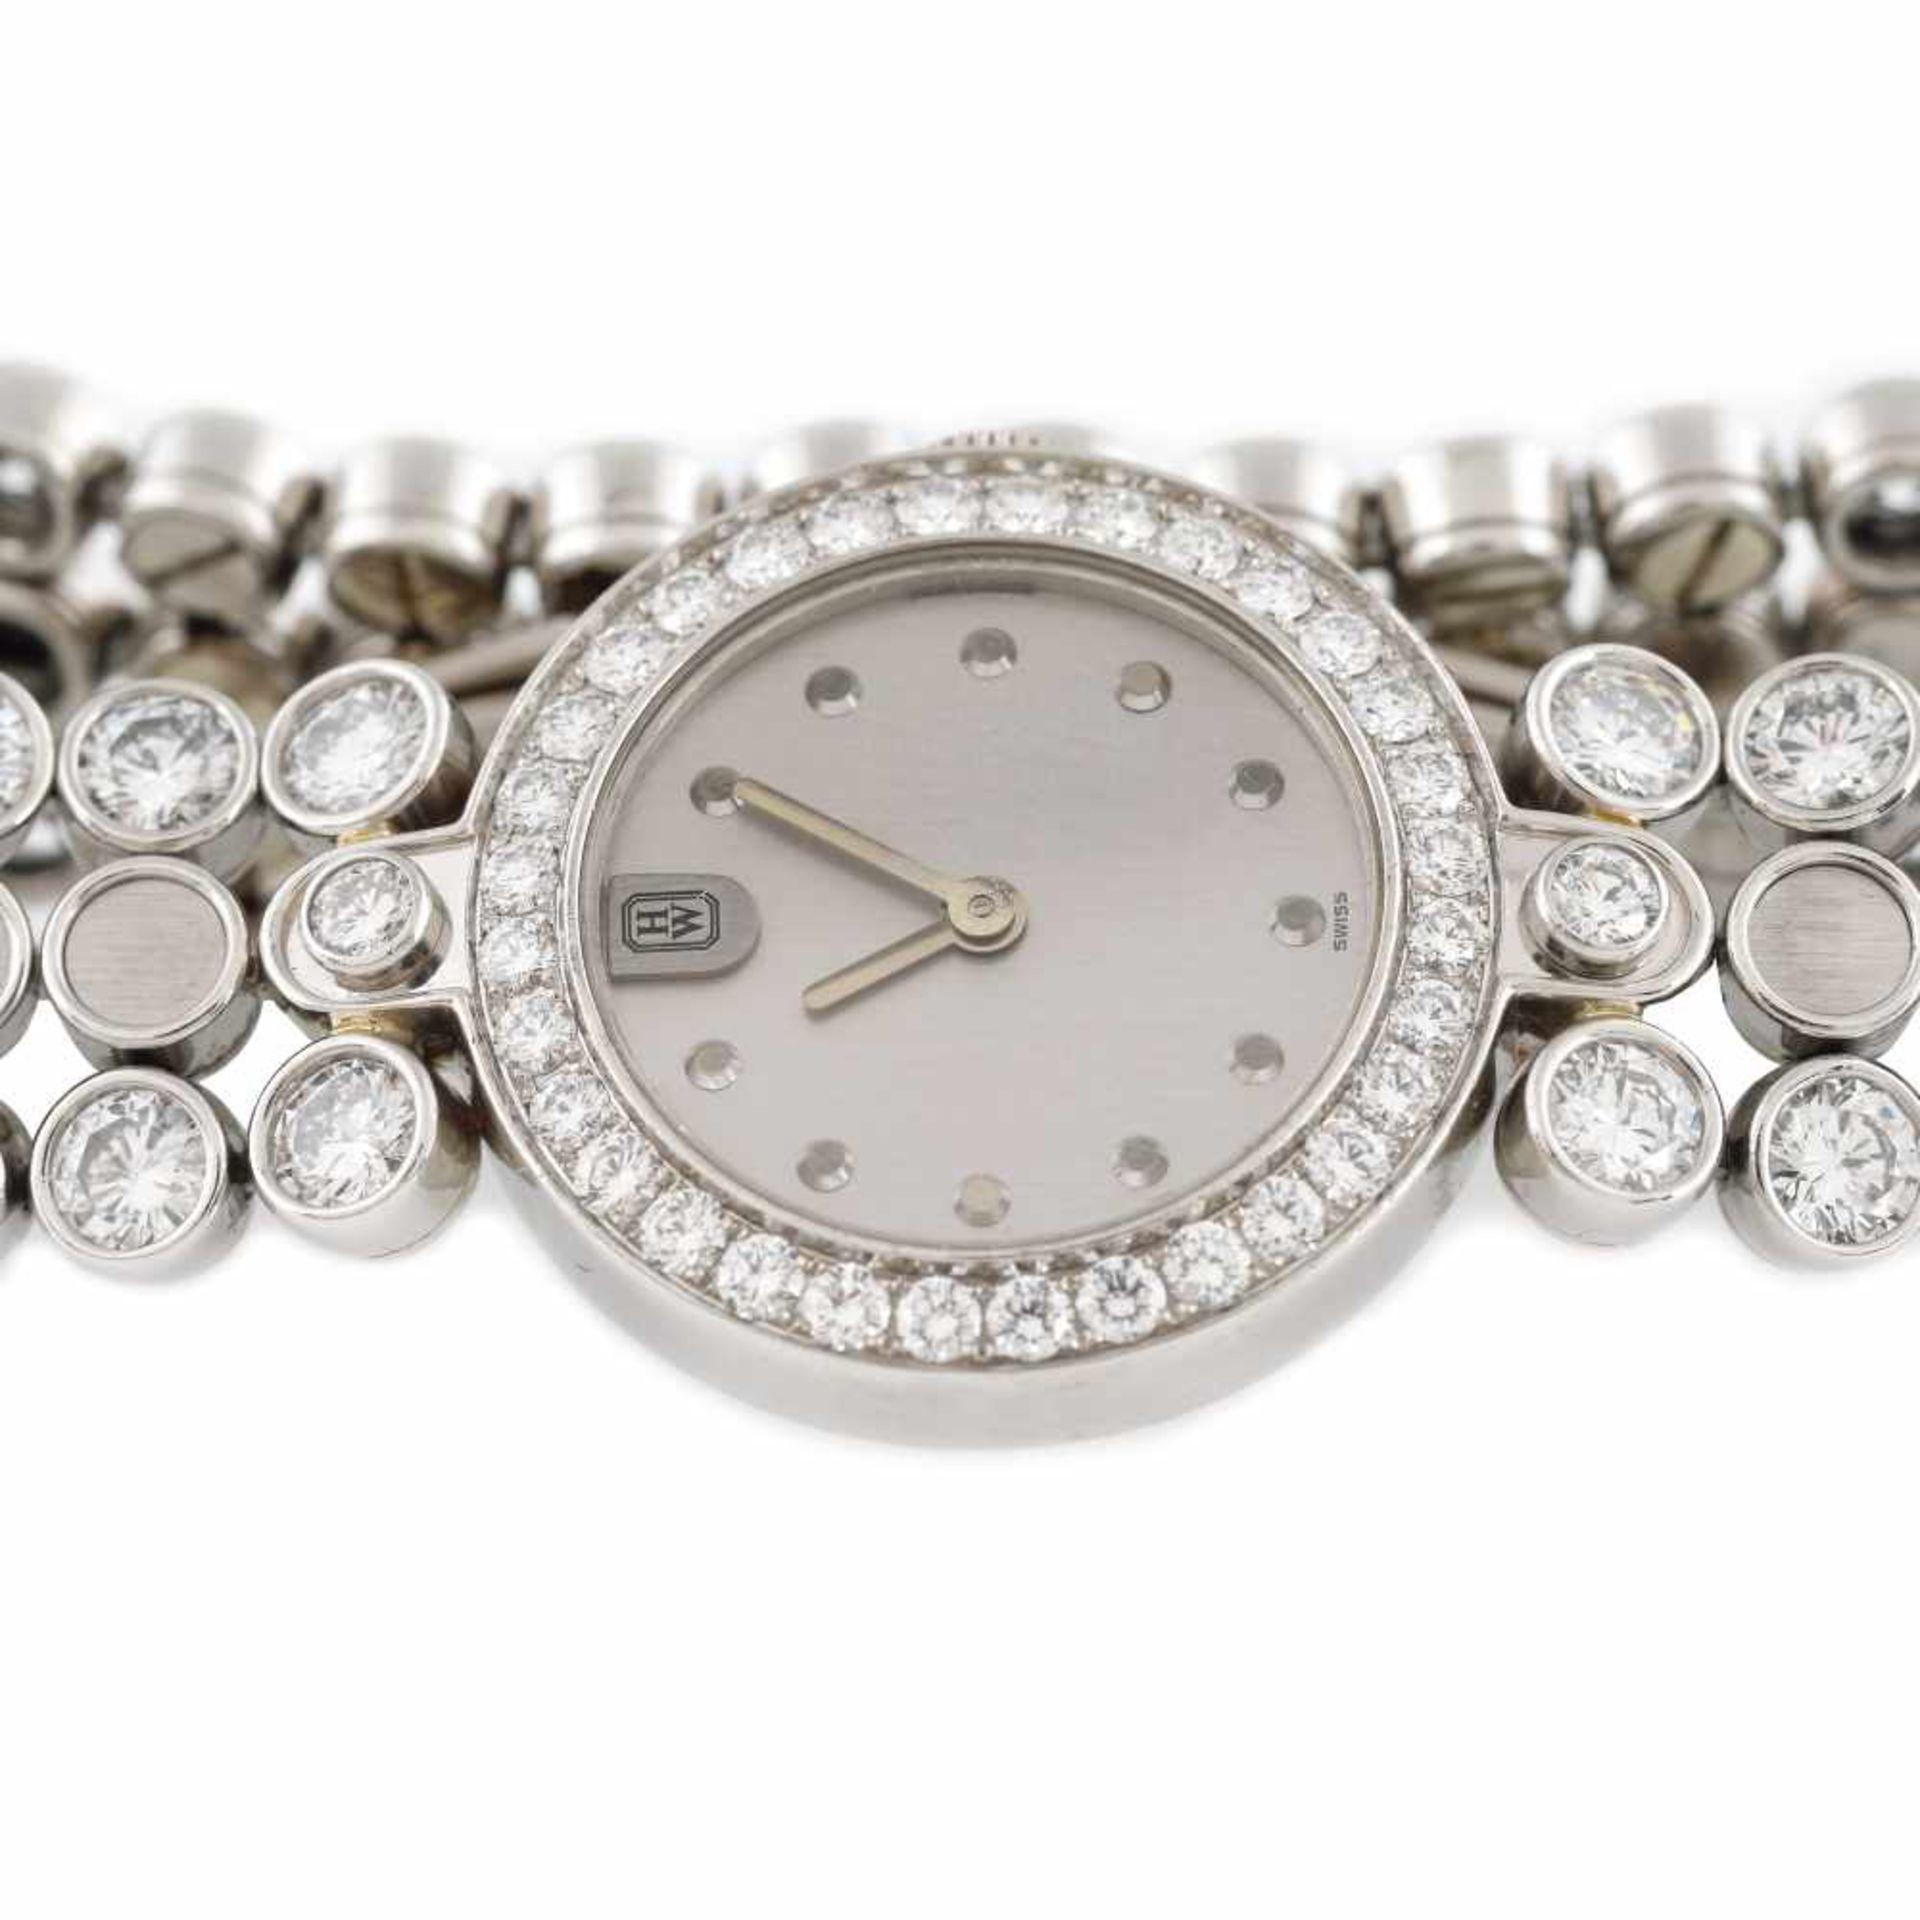 Harry Winston Premier Diamond Timepiece bracelet watch, platinum, women, decorated with diamonds, pr - Bild 4 aus 4